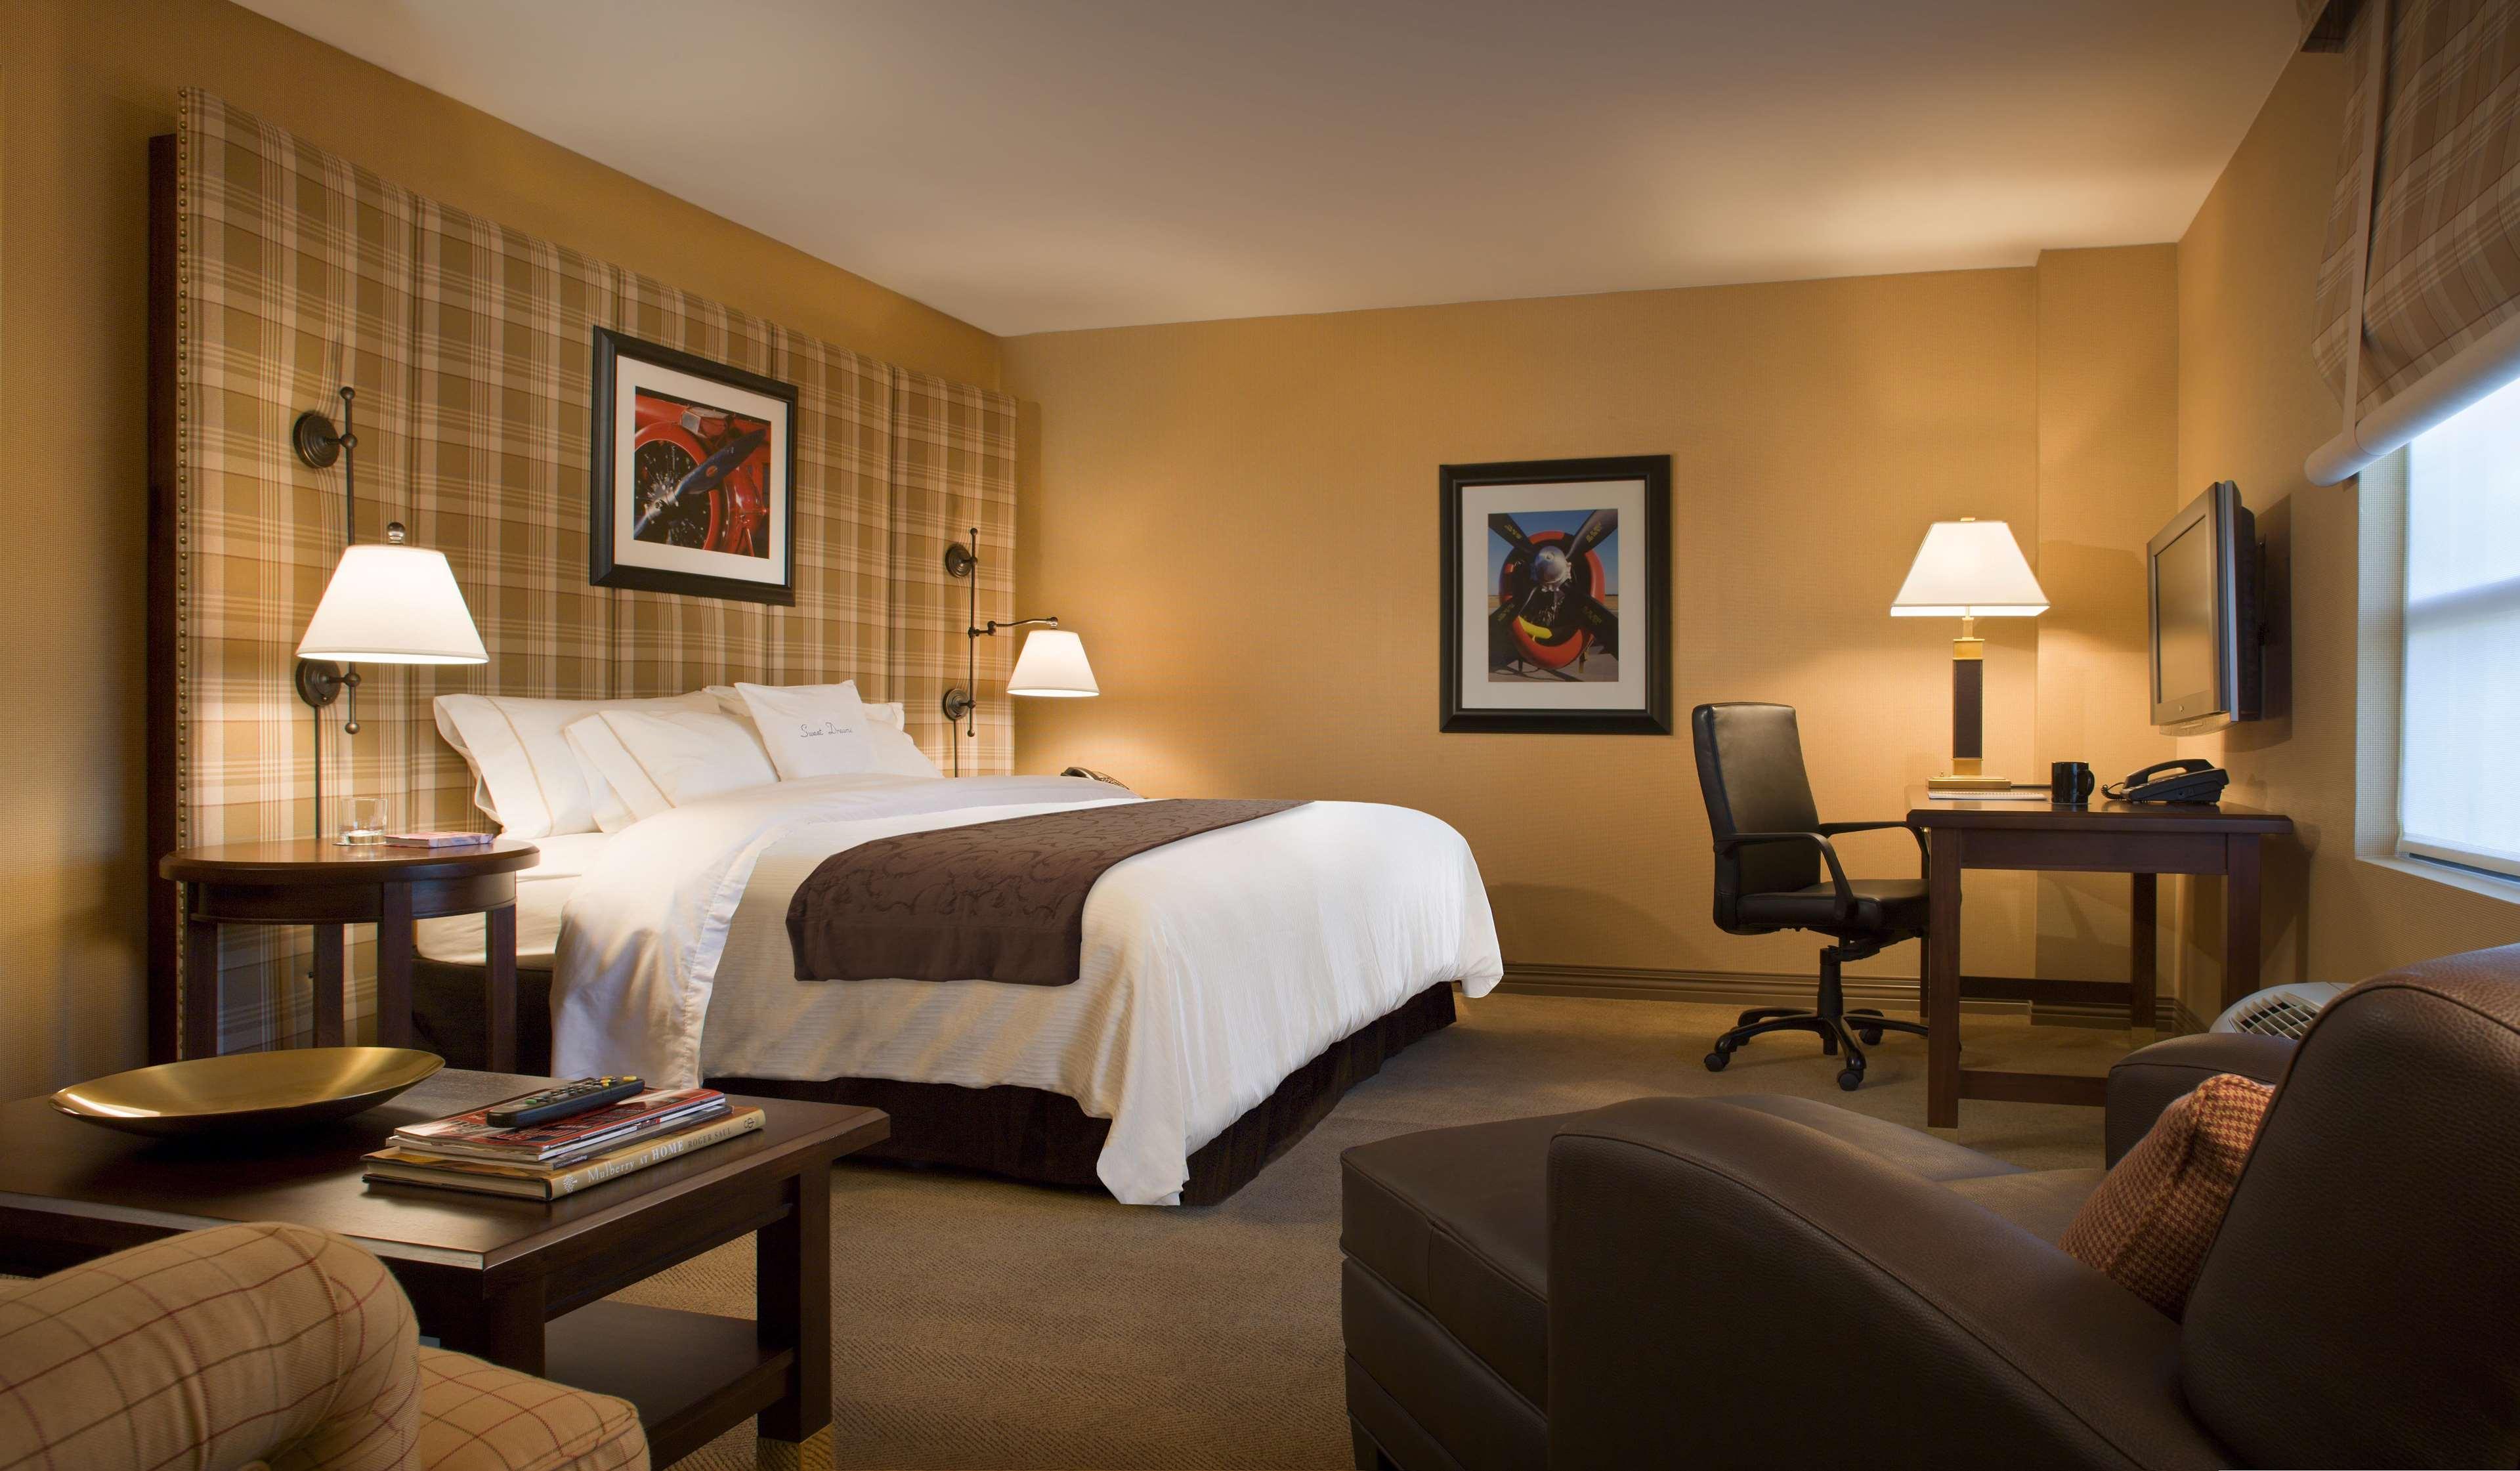 DoubleTree by Hilton Hotel Cincinnati Airport image 0